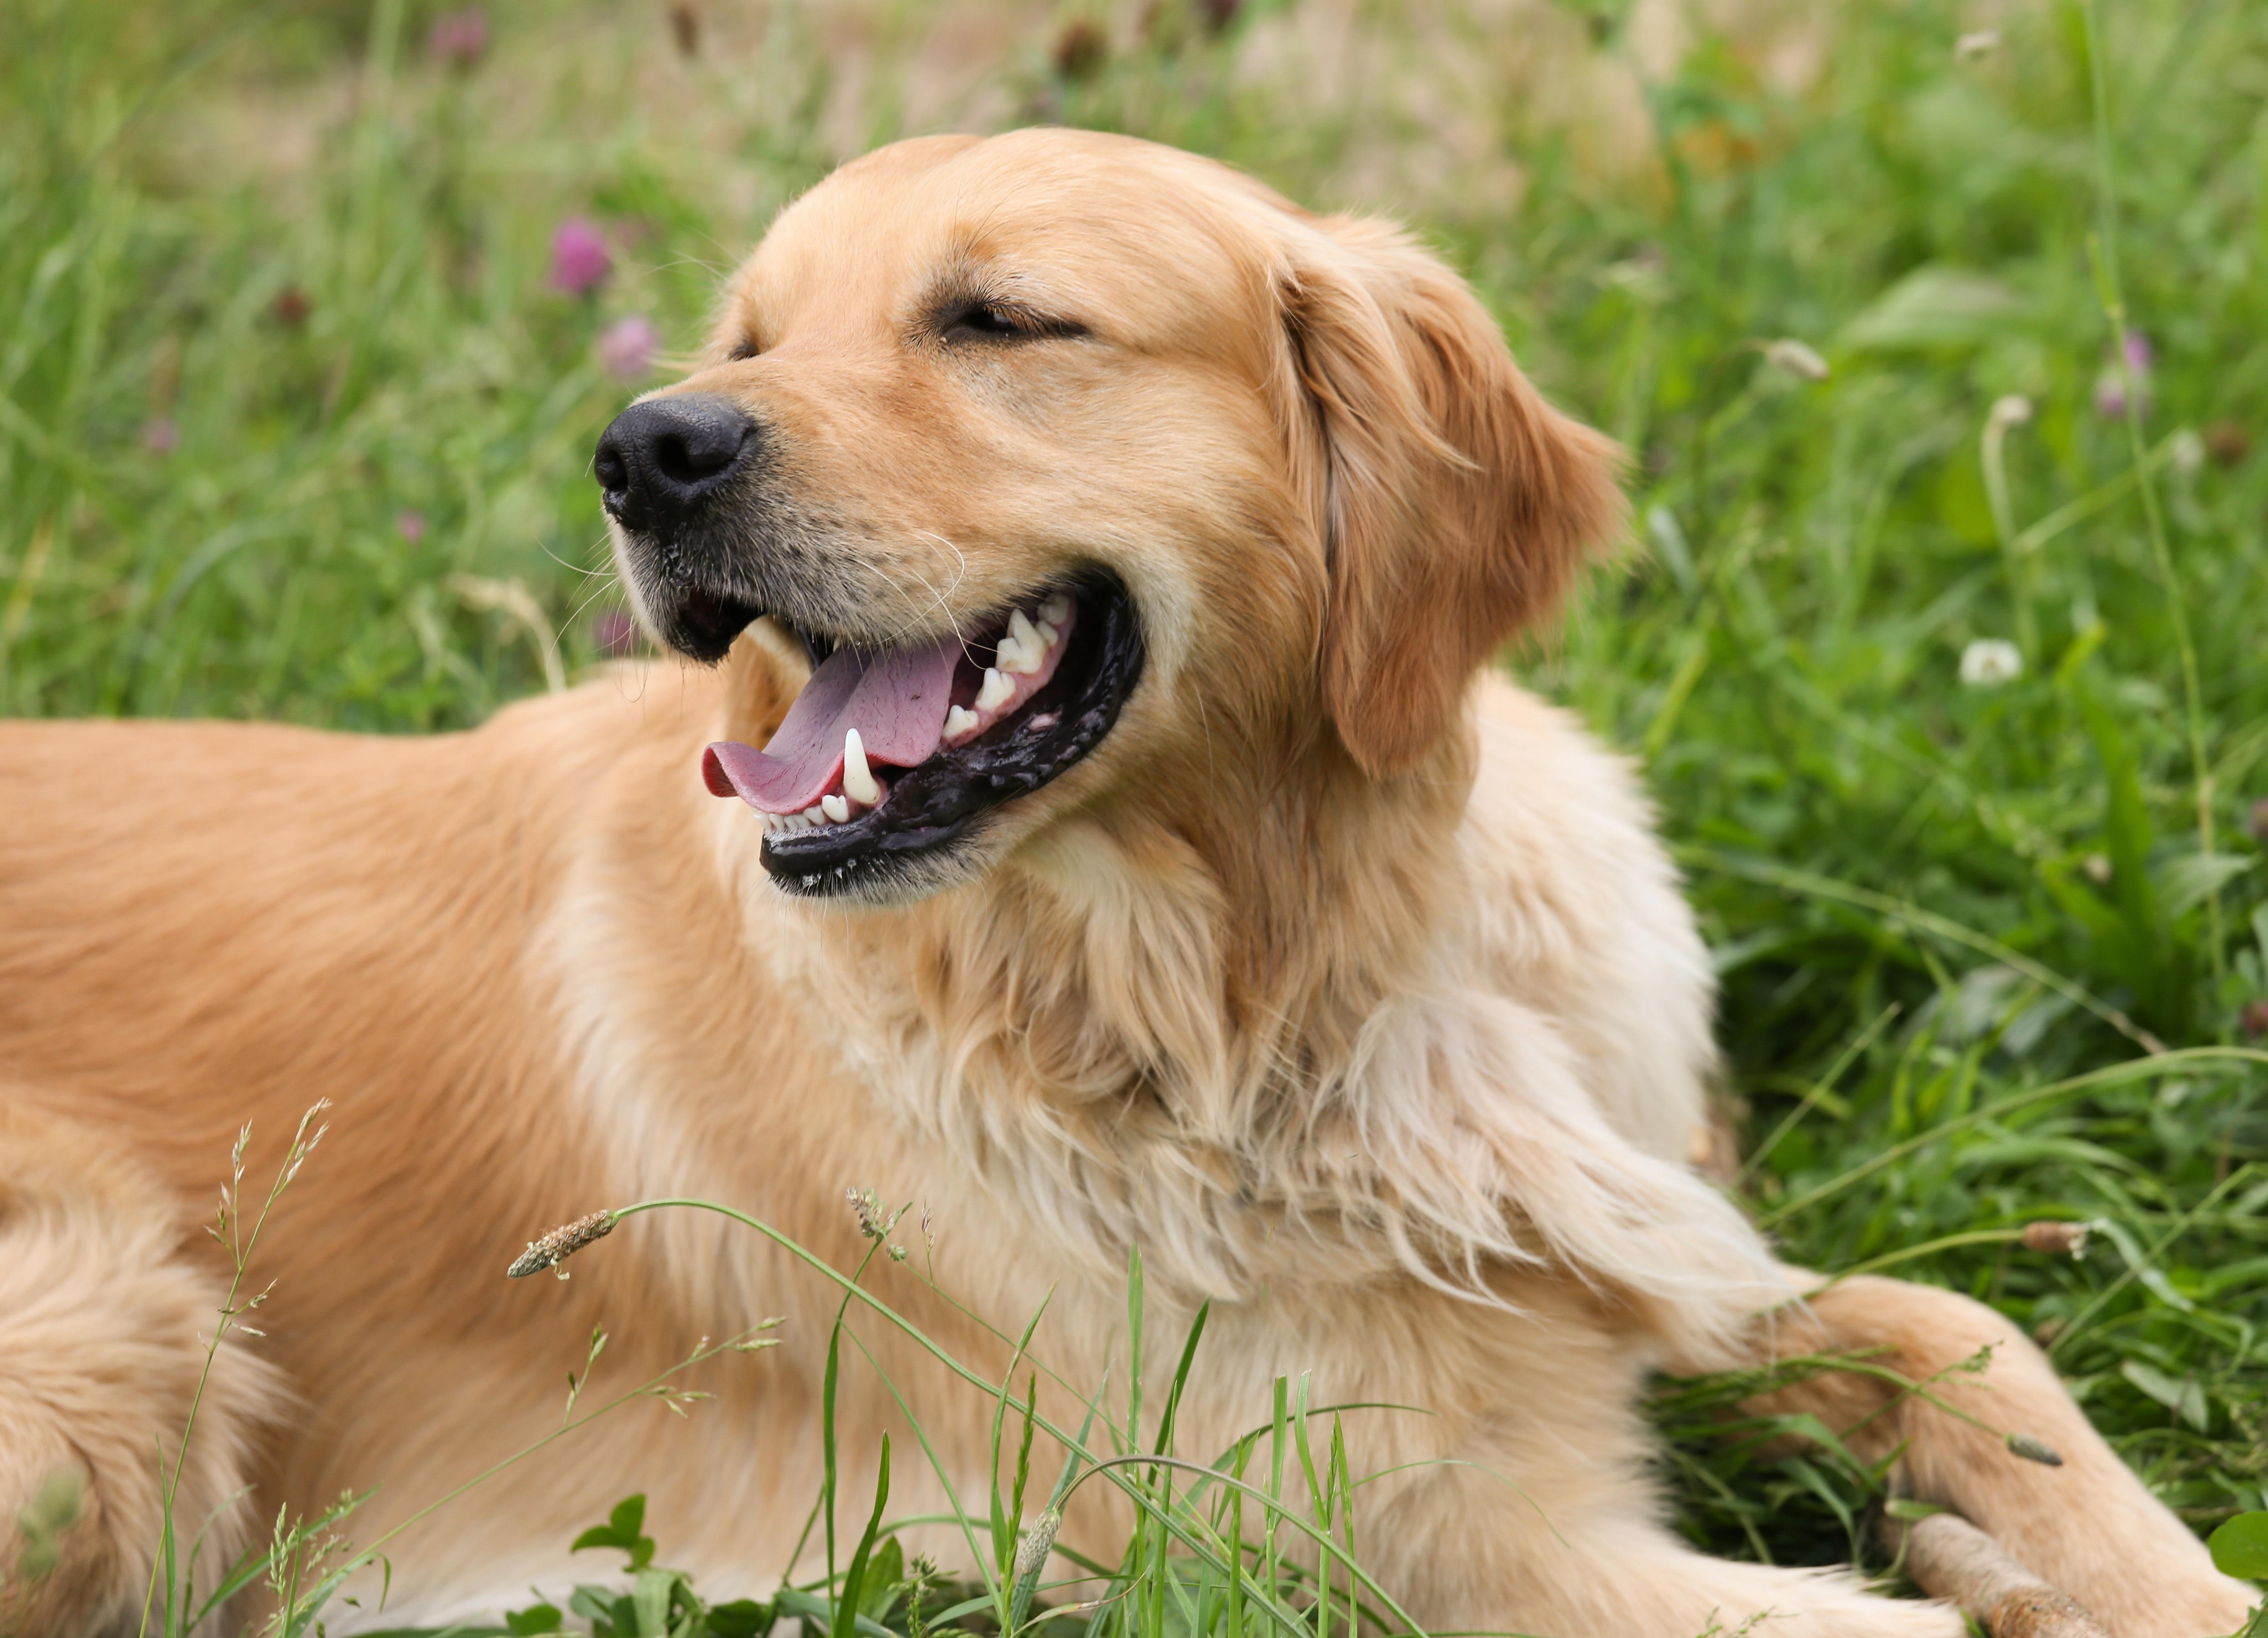 Pet, Animal, Dog, Friend, Loyal, HQ Photo